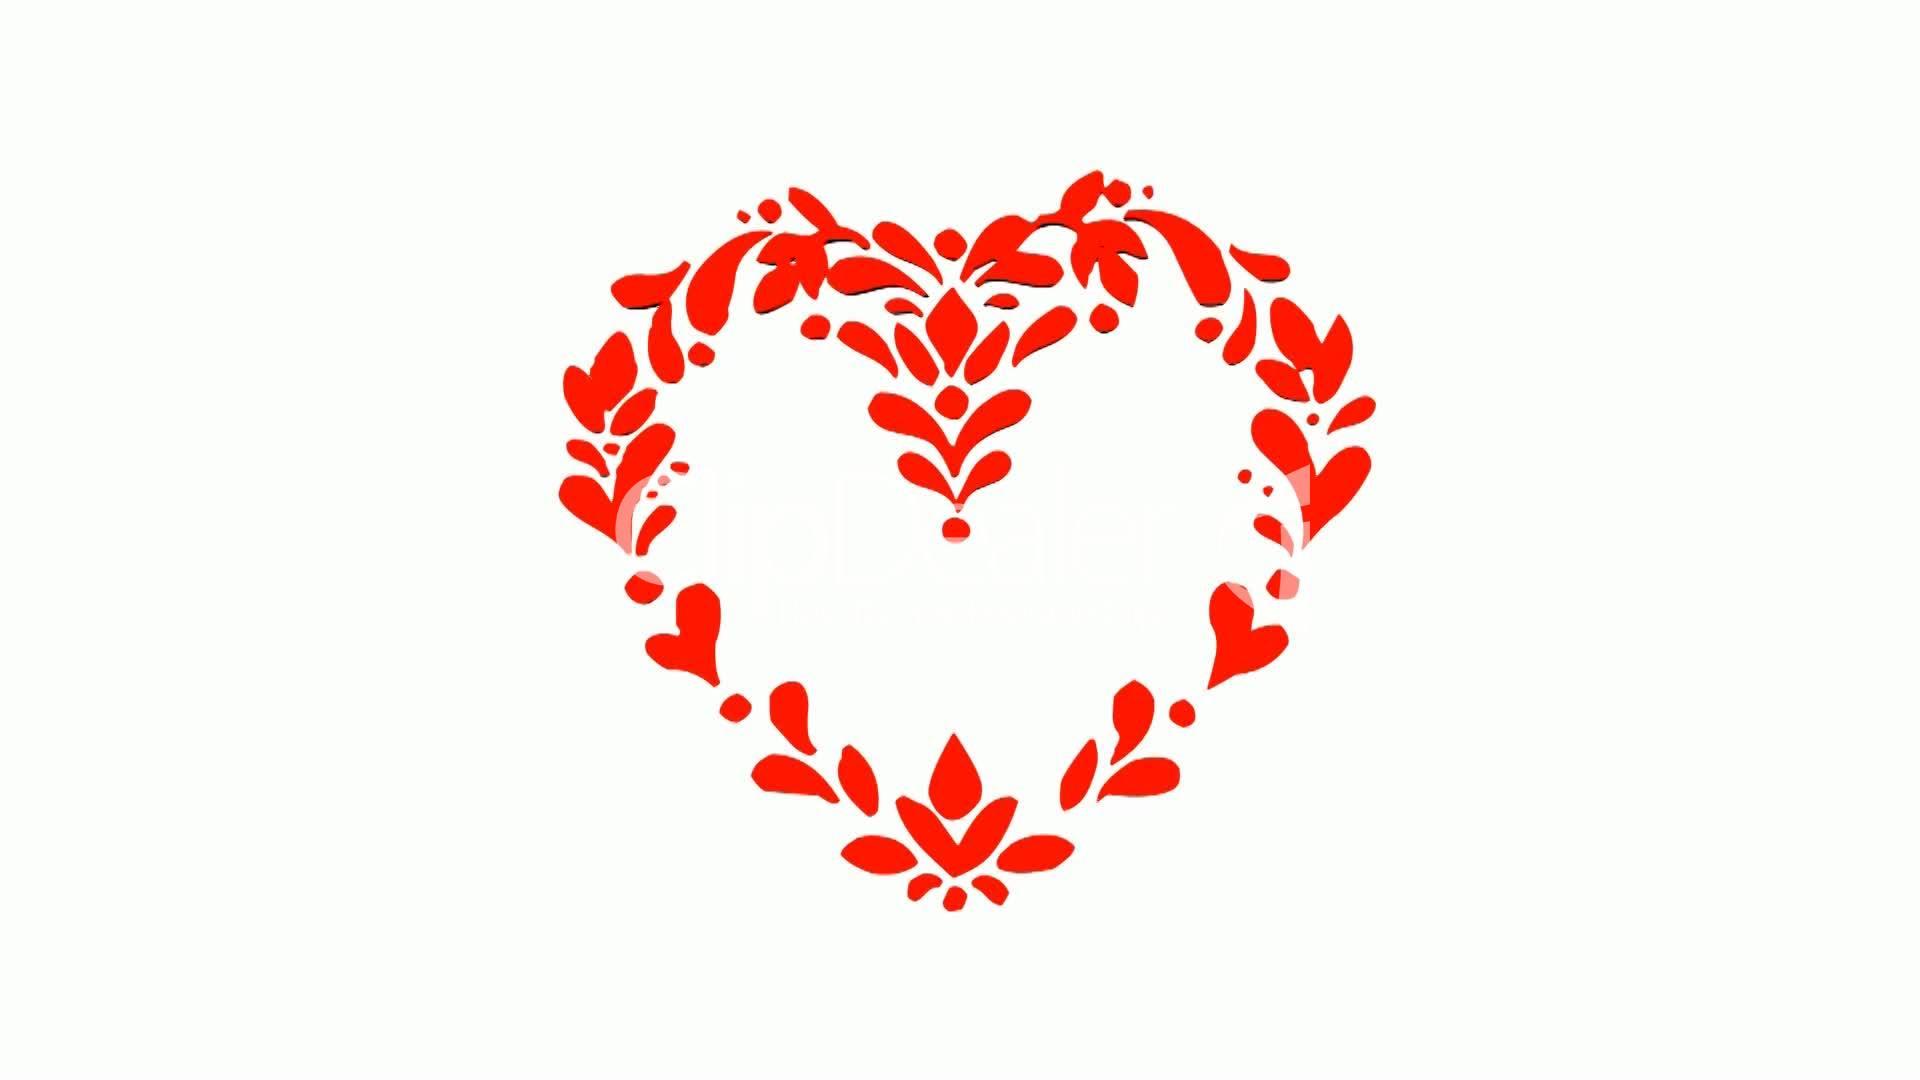 Rotation Of Flower Heart Love Red Symbol Heart Valentine